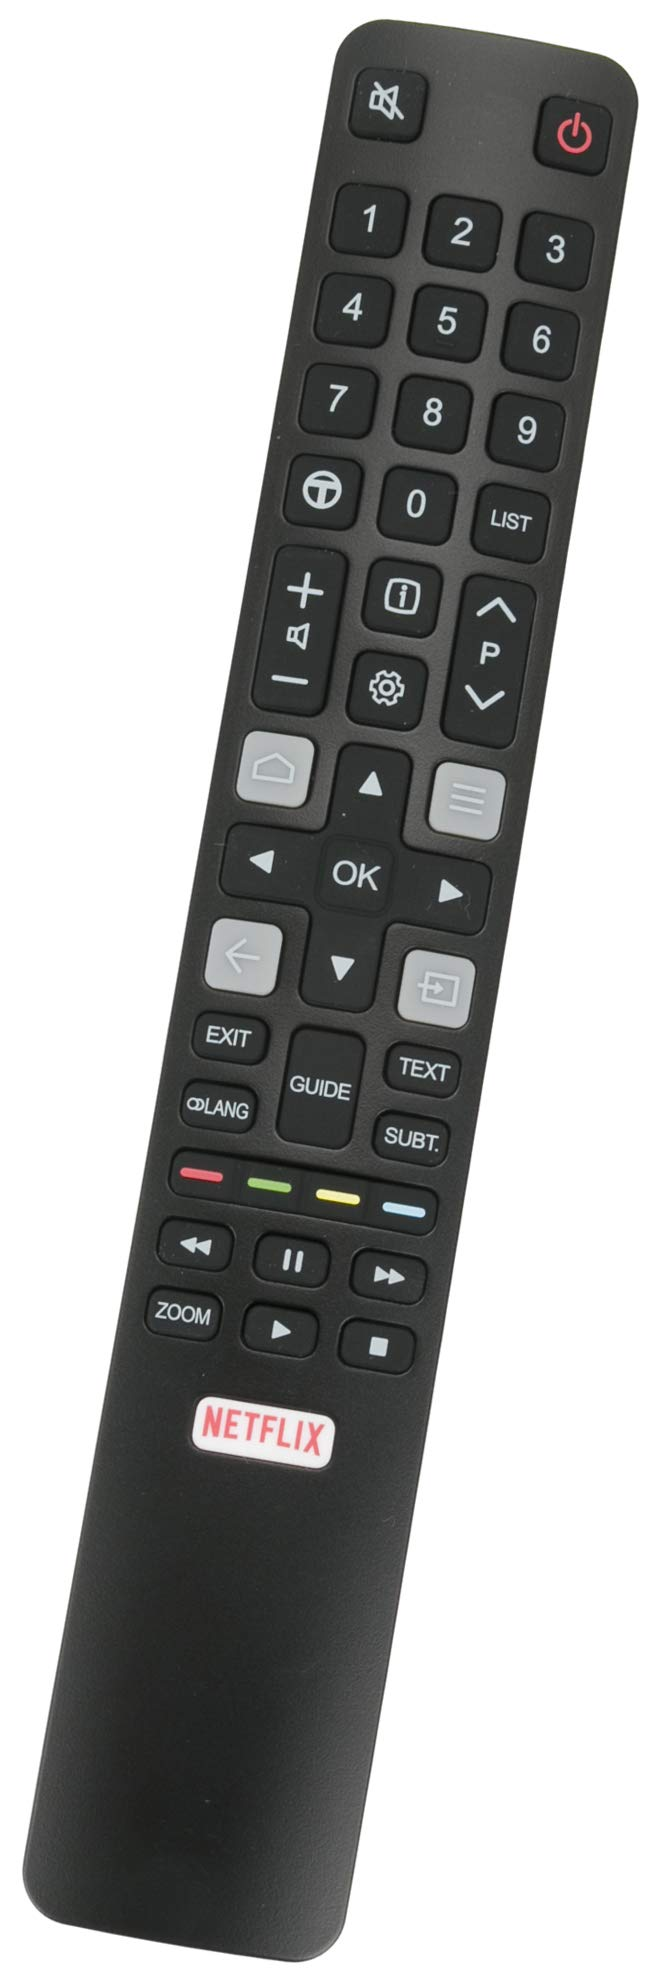 ALLIMITY 06-IRPT45-ARC802N Reemplace el Control Remoto por Thomson TCL 4K UHD QLED TV 55UD6406 43UC6406 U50P6046 U70C7026 75EP660 U55X9006 65DC766 U65S9906 65DP661 U65X9026 U49P6046 U65P6046 65DP660: Amazon.es: Electrónica